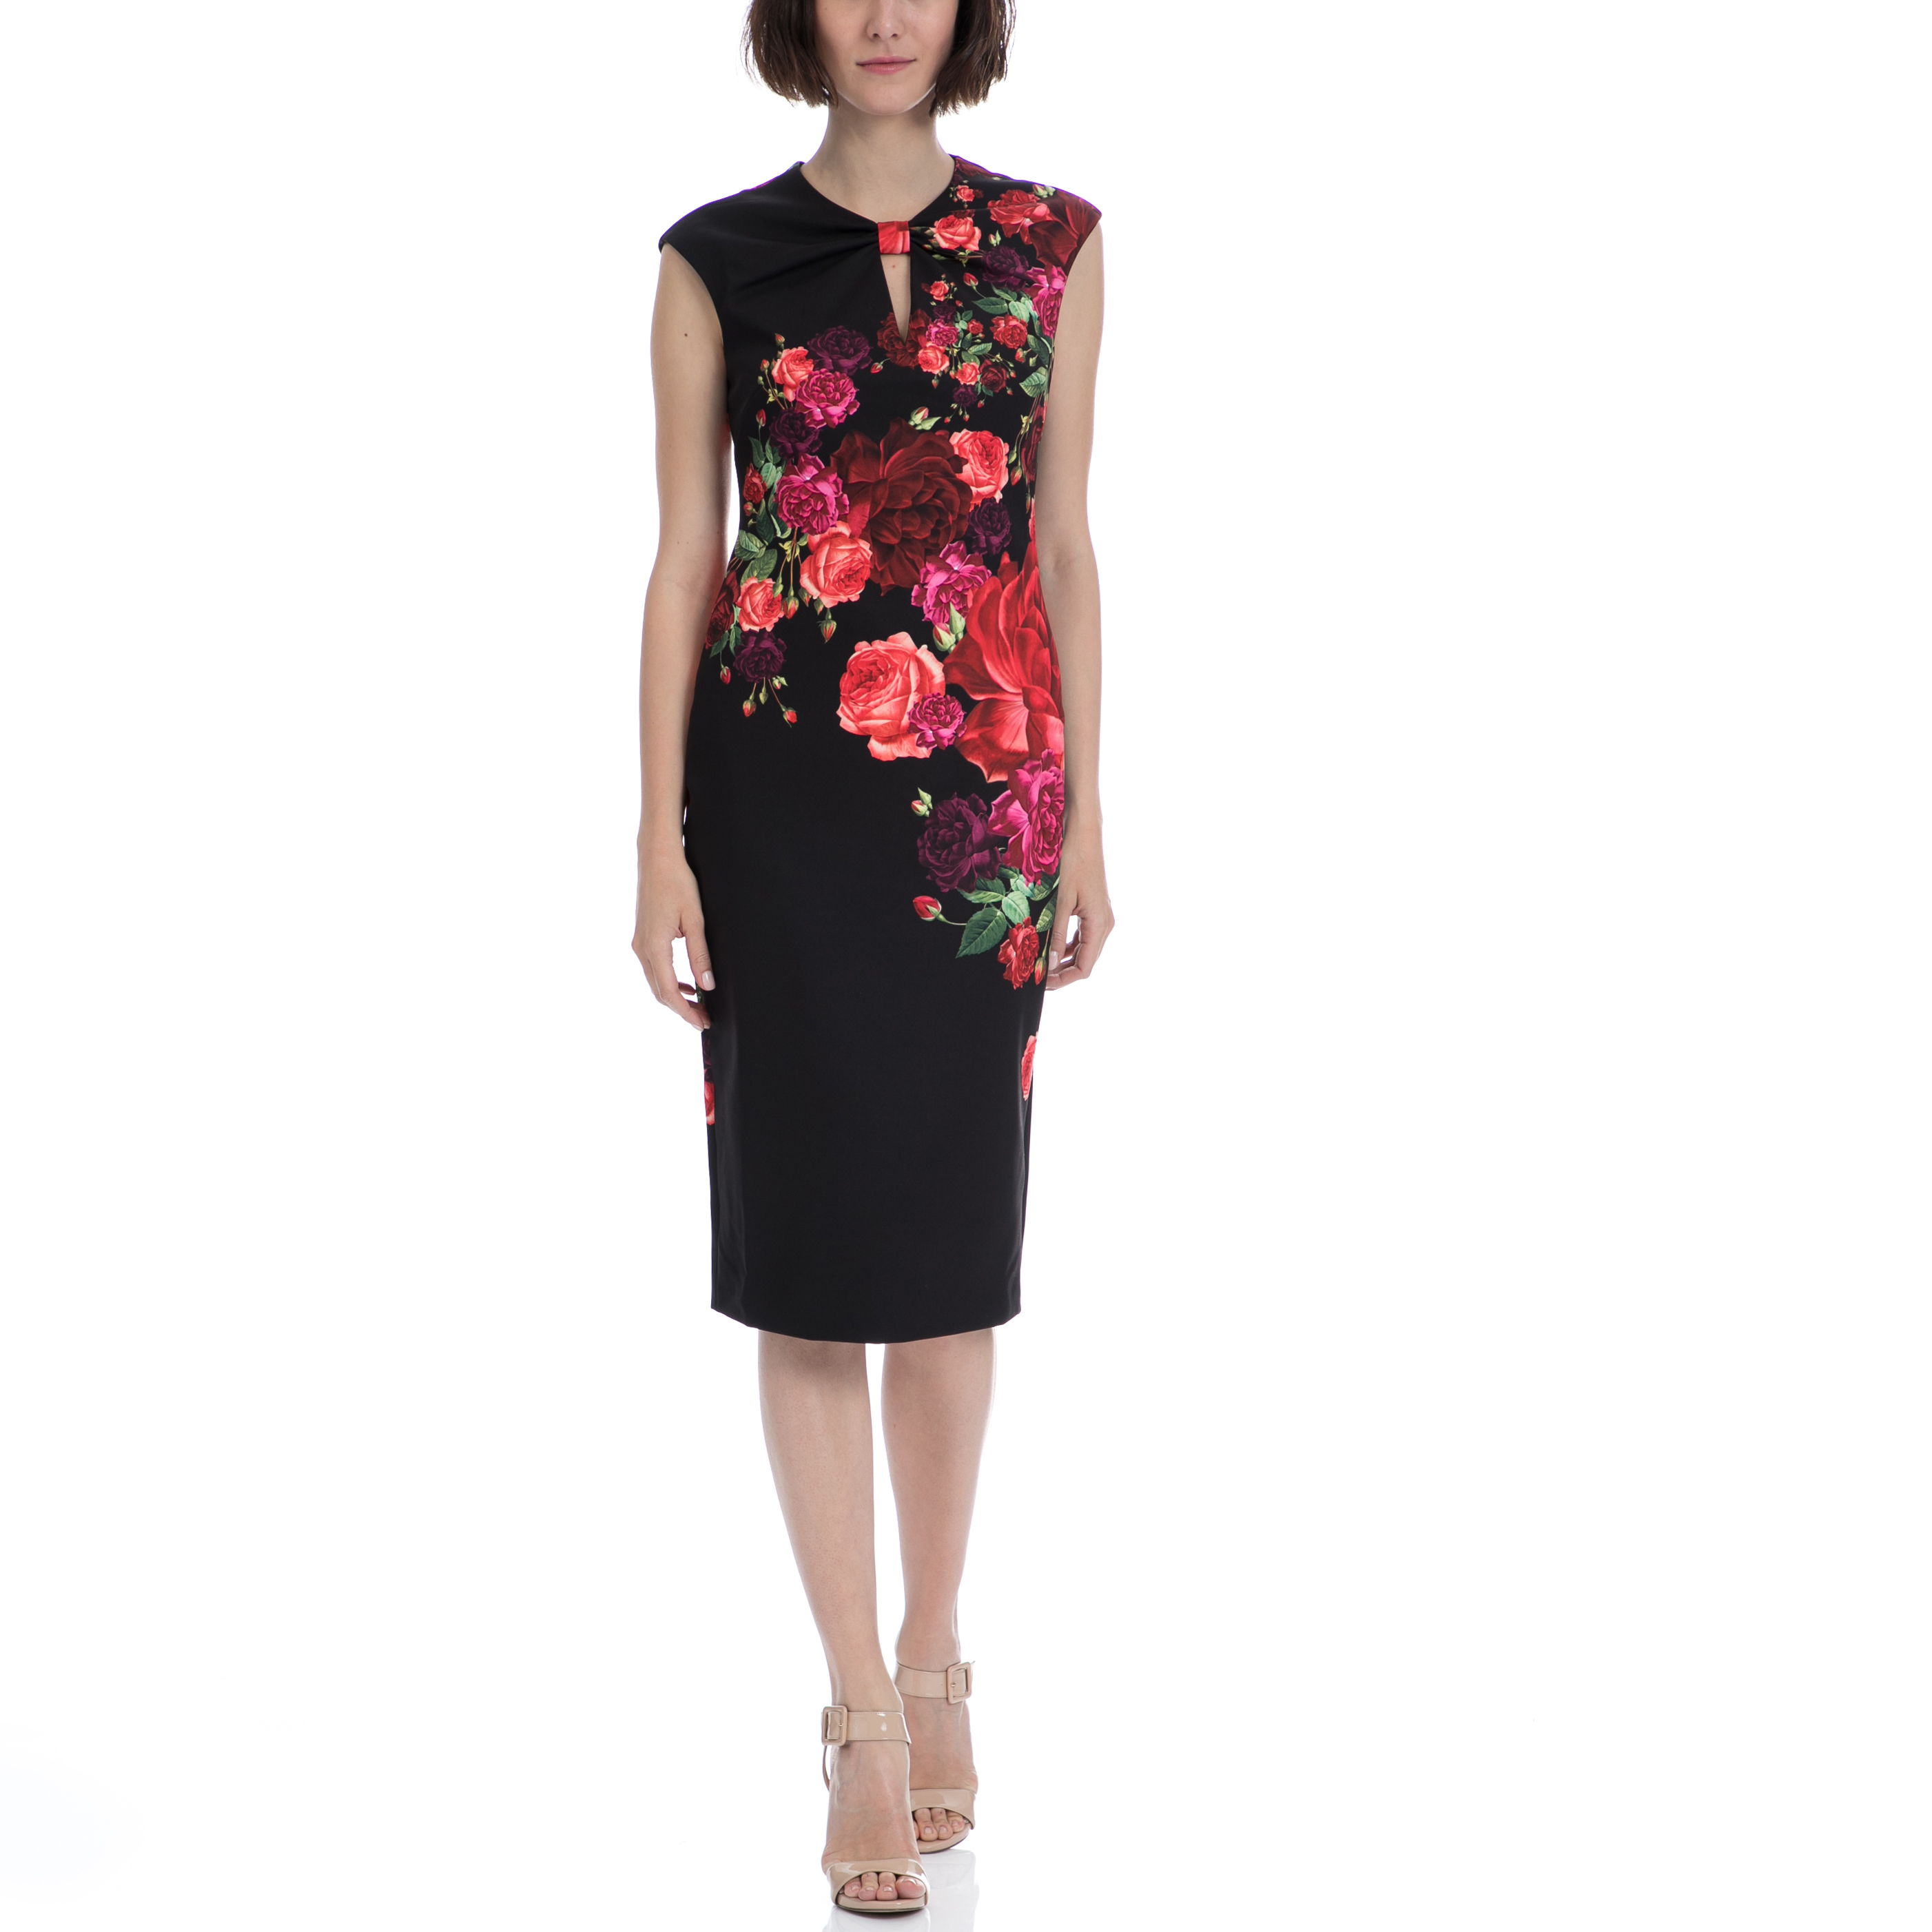 TED BAKER - Μίντι φόρεμα TED BAKER MIRRIE JUXTAPOSE ROSE KNOT DRESS μαύρο φλοράλ Μίντι εφαρμοστό φόρεμα σε μαύρο χρώμα με μοτίβο από μεγάλα λουλούδια. Είναι αμάνικο και διαθέτει στρογγυλή λαιμόκοψη. Κλείνει με φανερό φερμουάρ στην πλάτη και διαθέτει μοντέρνο τριγωνικό άνοιγμα στο